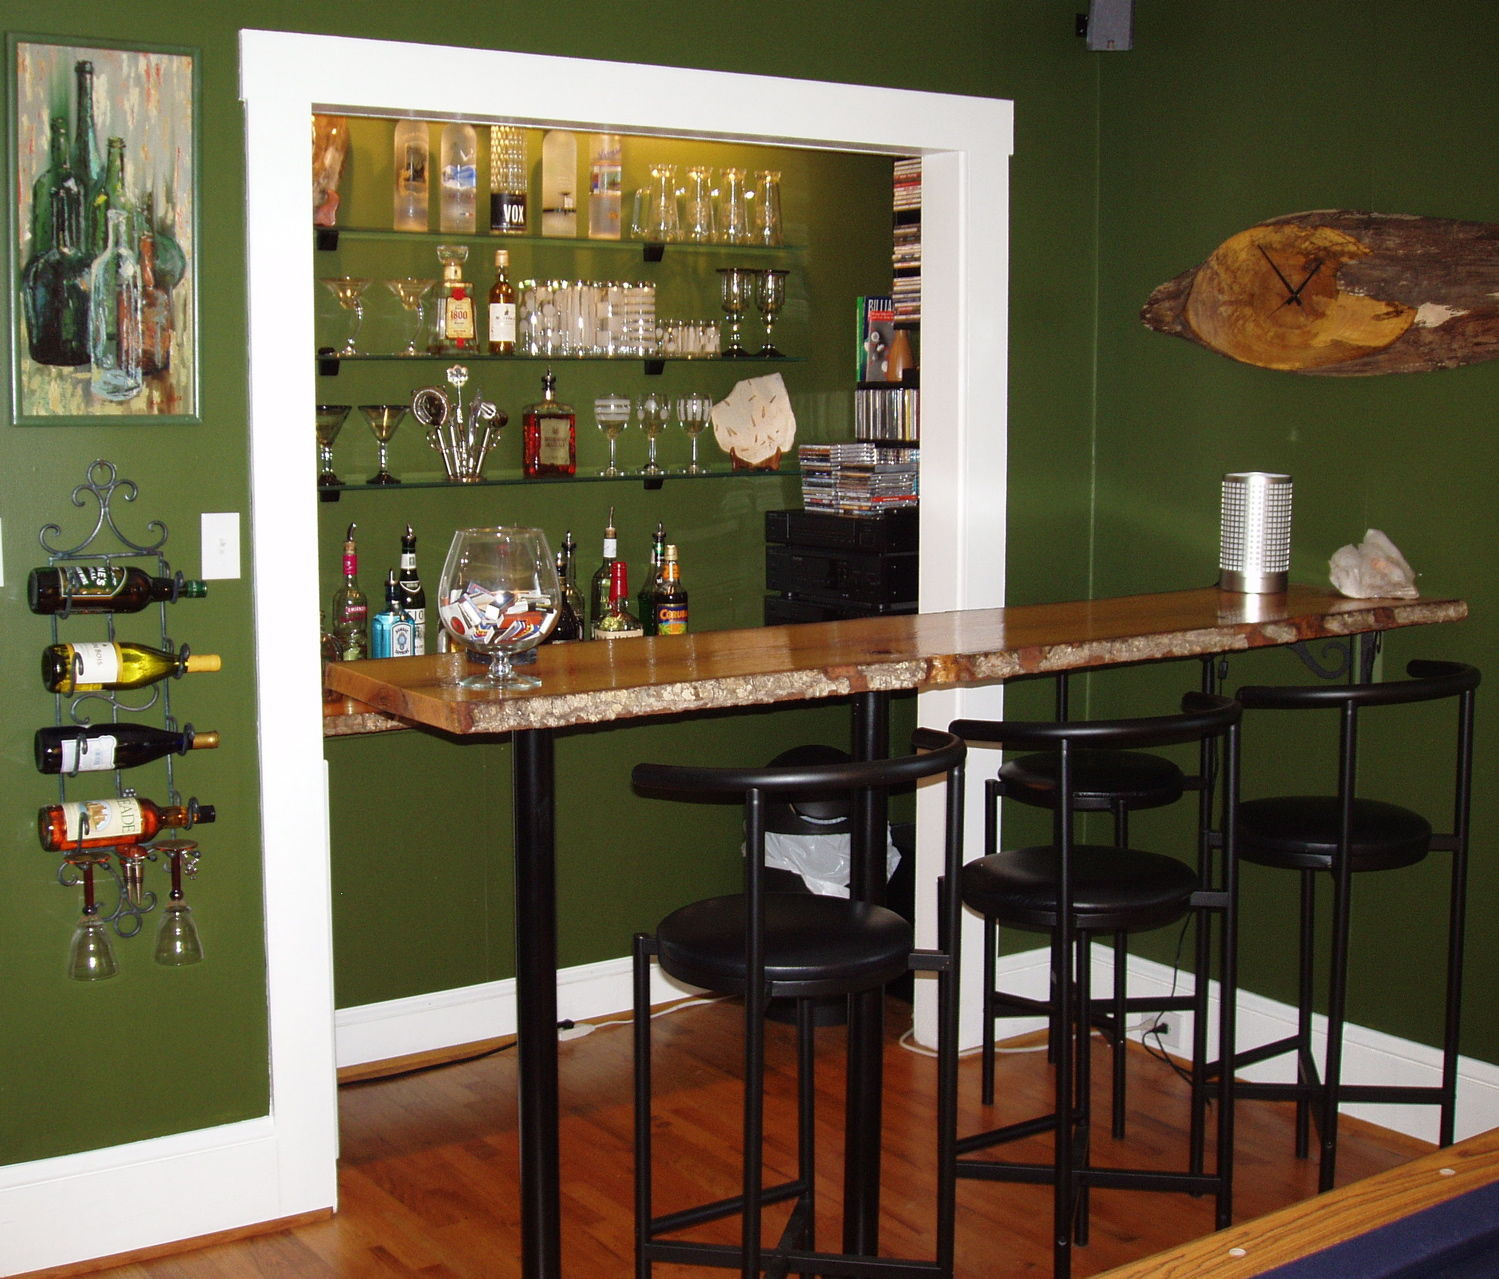 A Repurposed Closet Designed By Julie Cargill. She Turned A Closet Into A  Bar Area